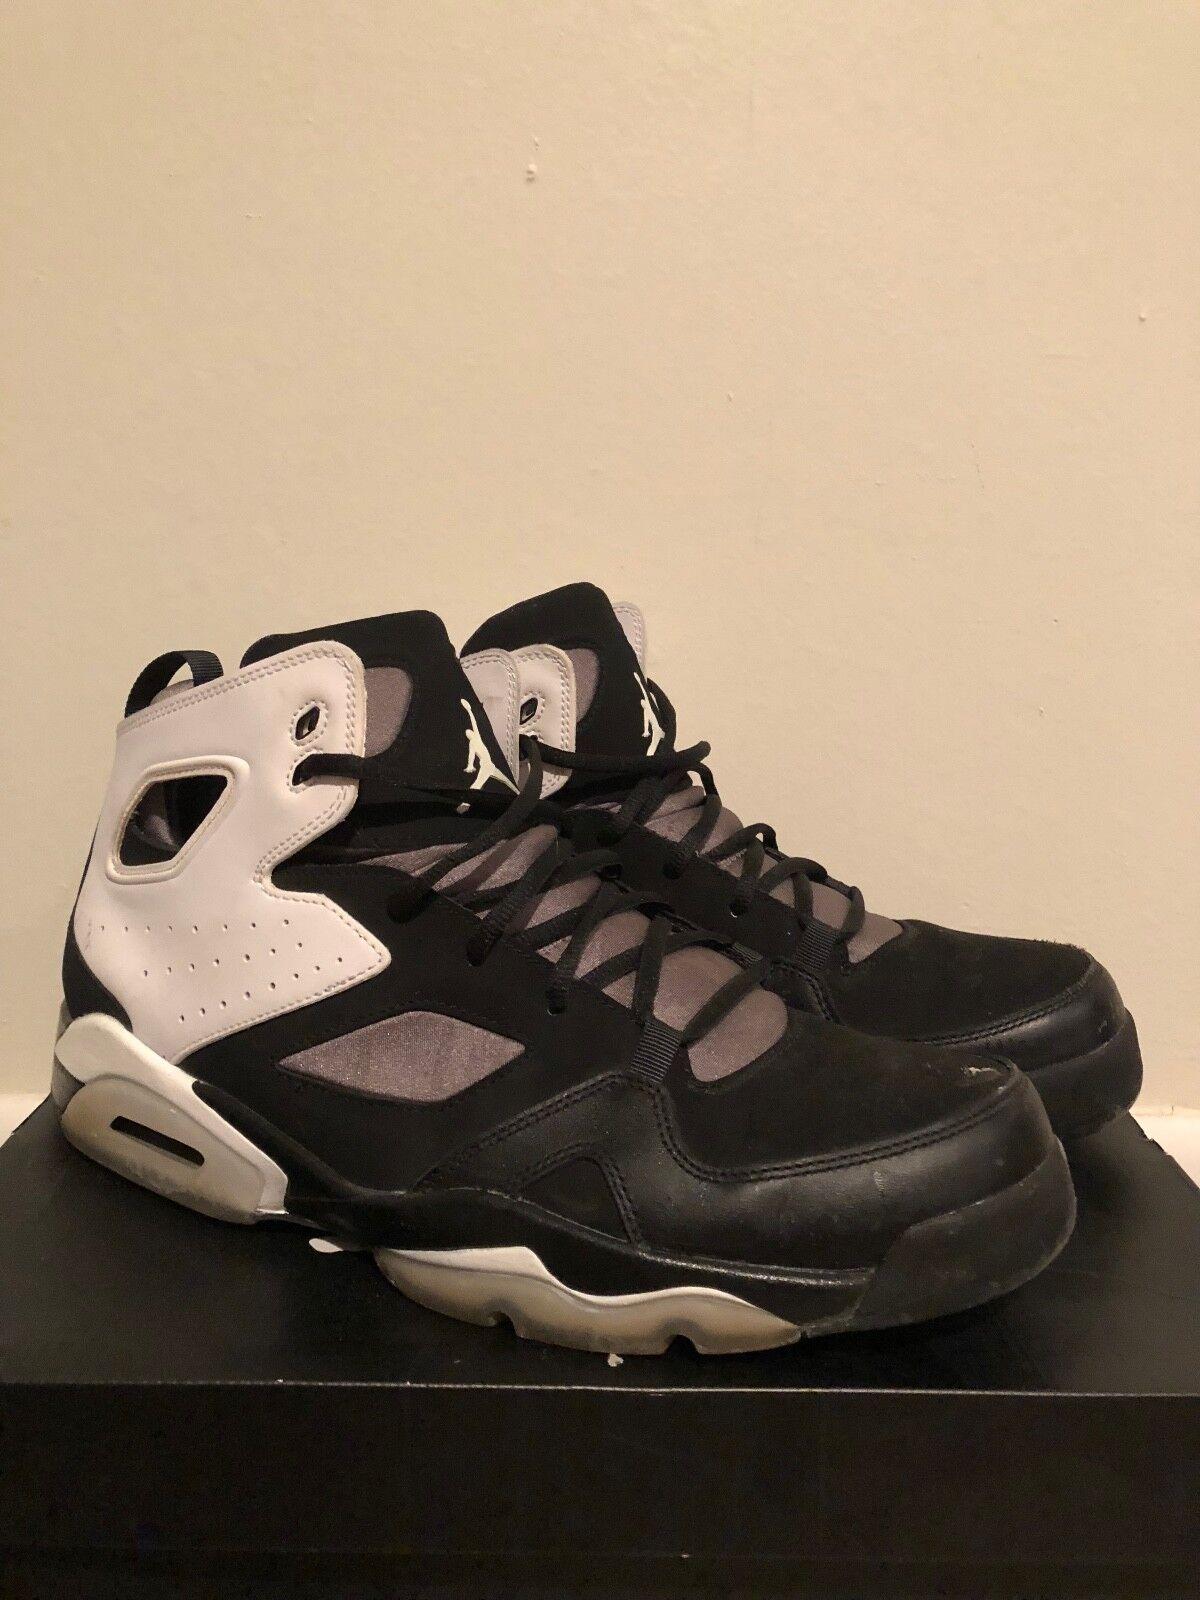 schwarz basketballschuhe & WEISS jordan flug basketballschuhe schwarz w / box 577f94